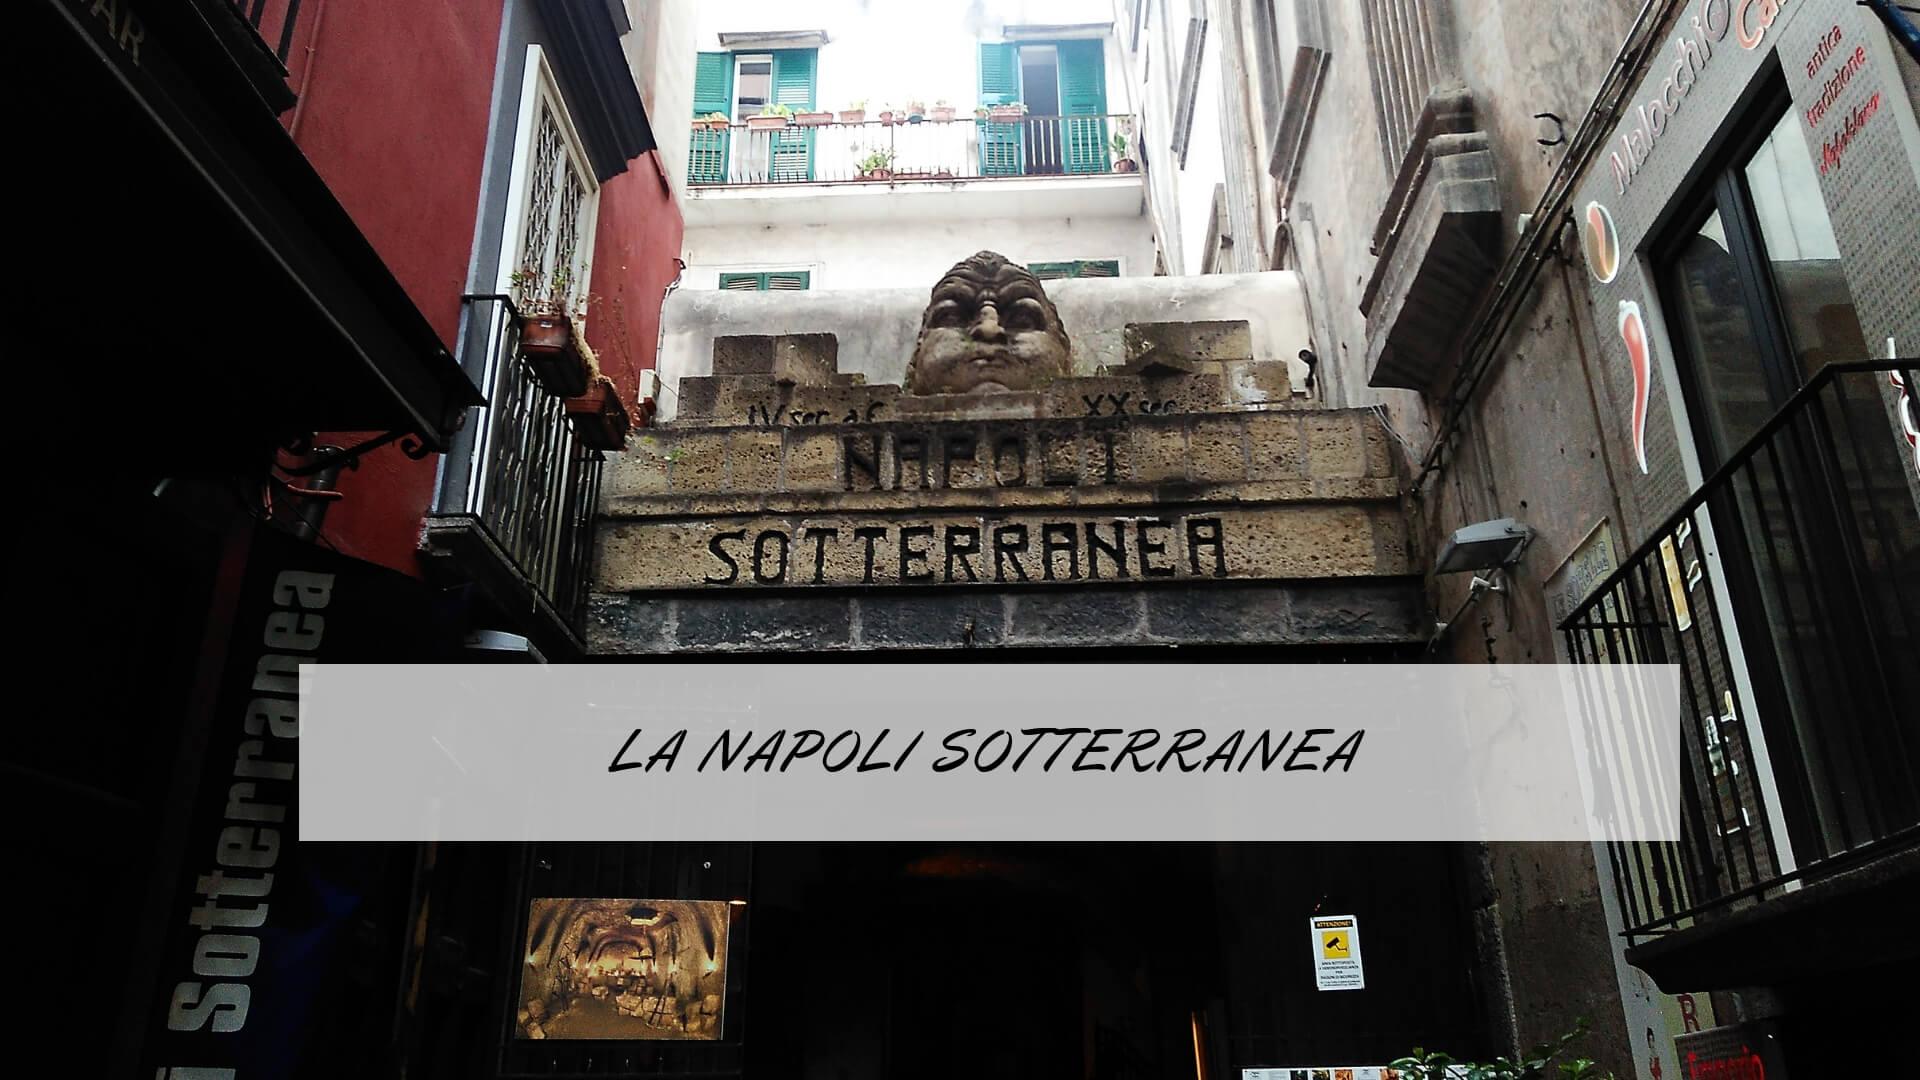 La Napoli Sotterranea